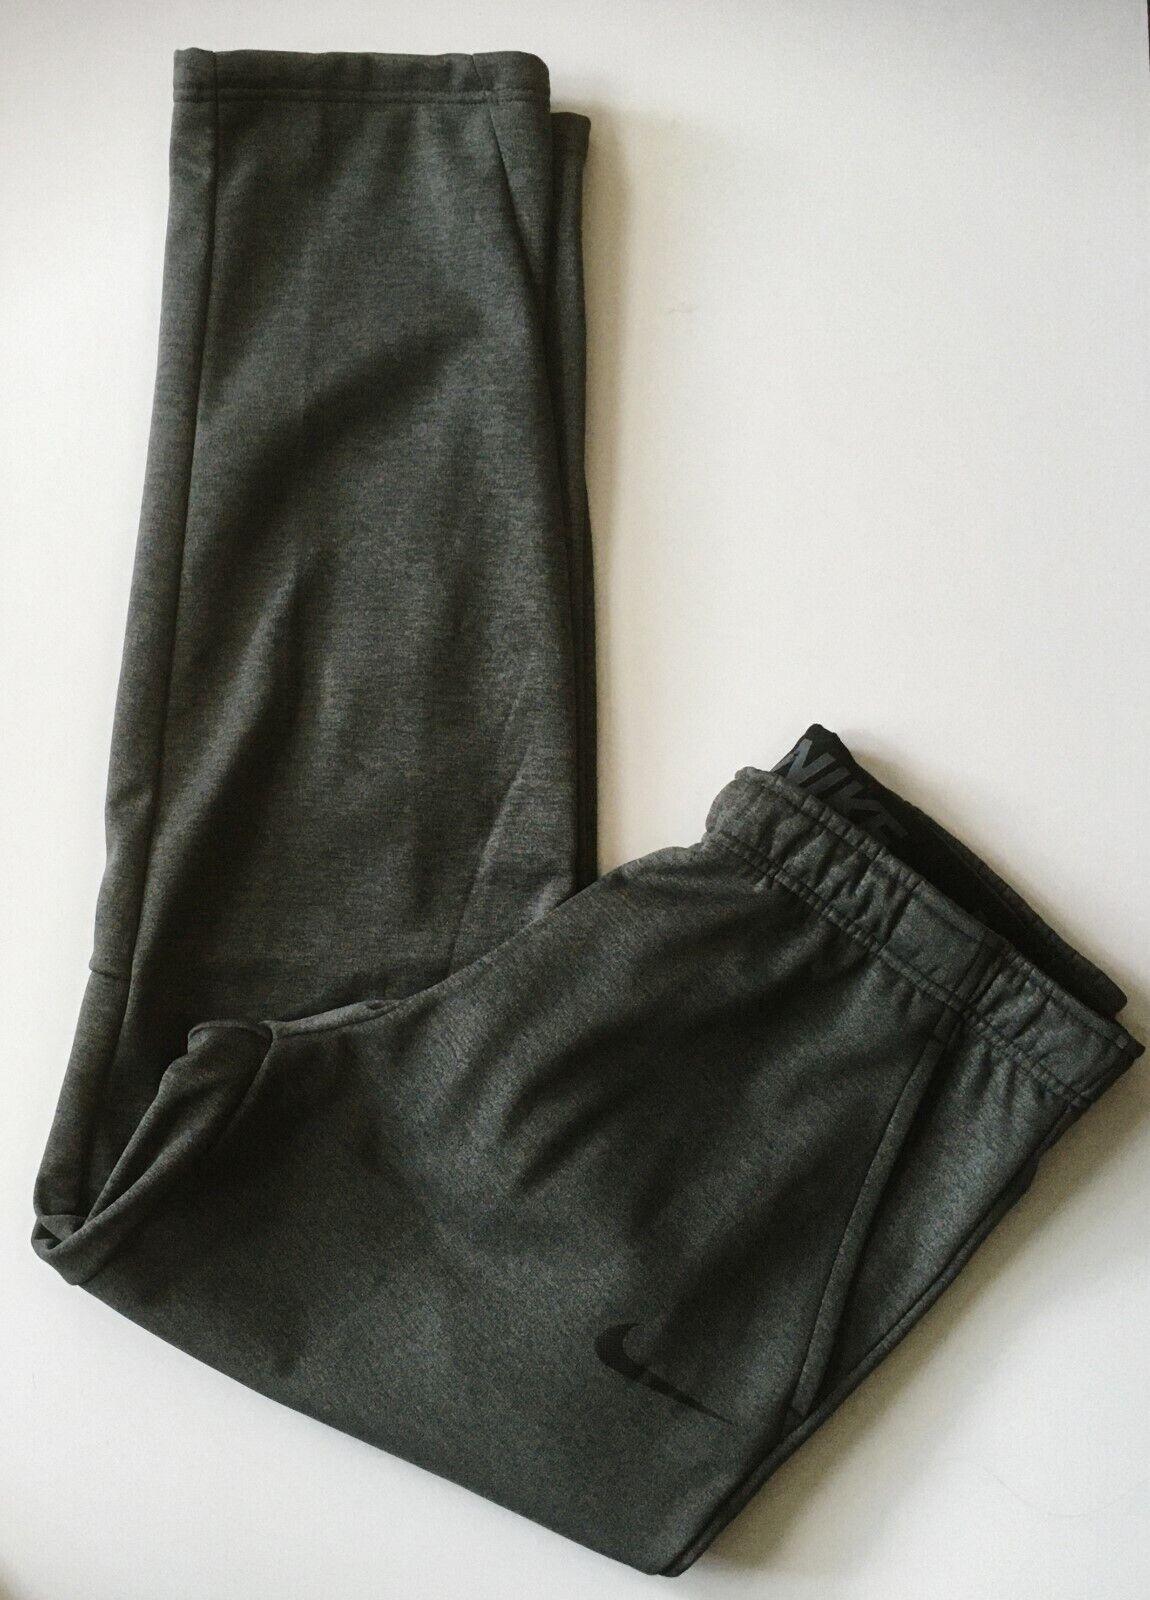 NIKE Men's $55 THERMA Fleece Training Pants NEW 932253-071 D